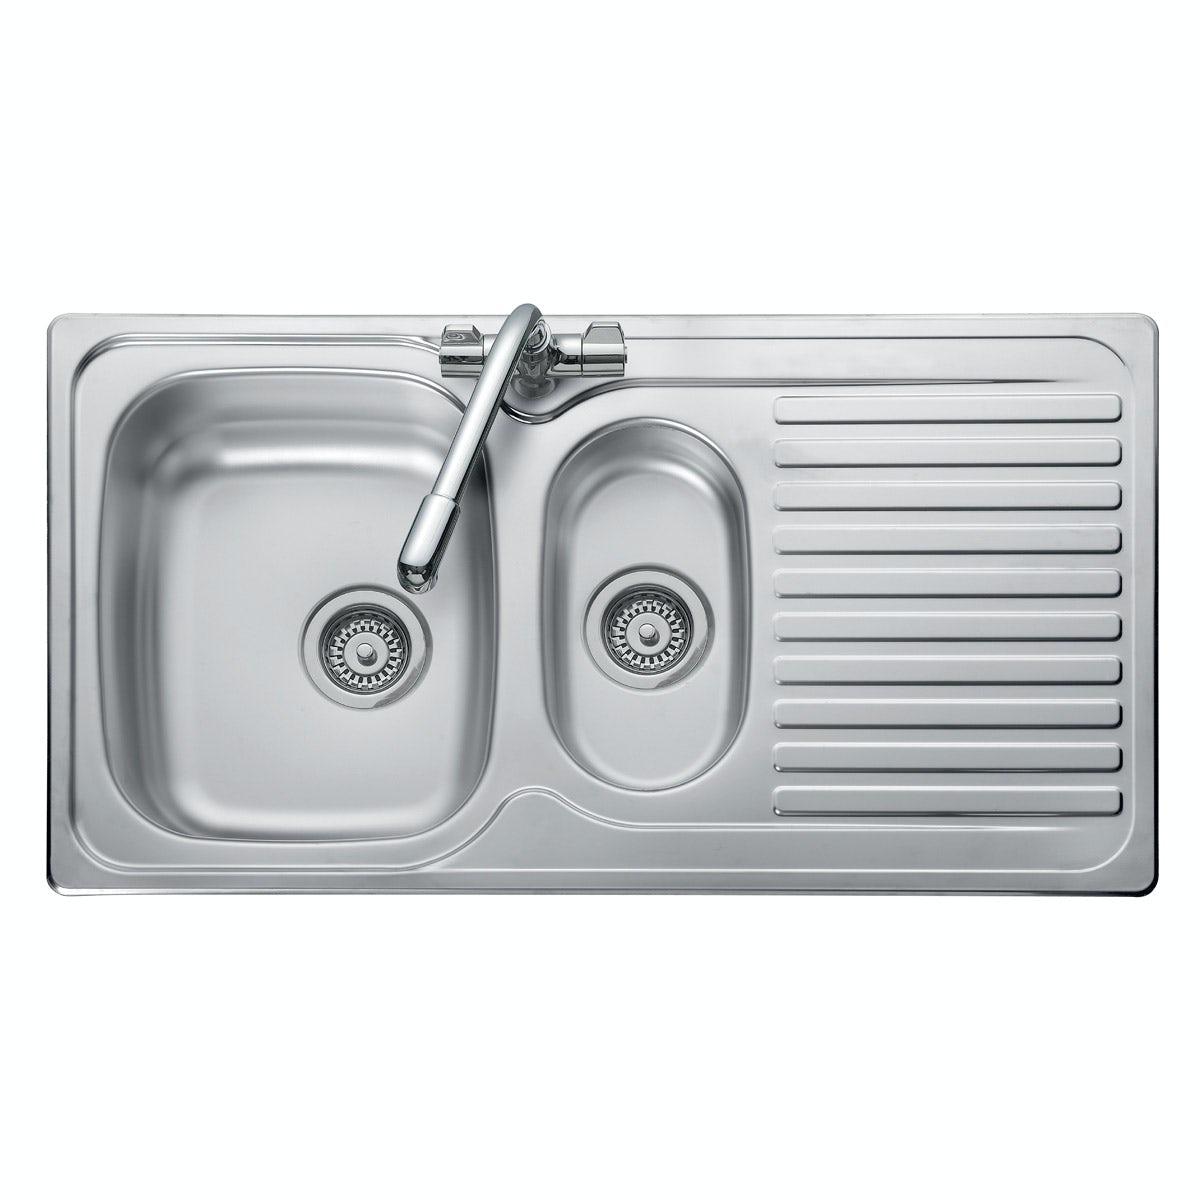 Leisure Linear 1.5 bowl reversible kitchen sink